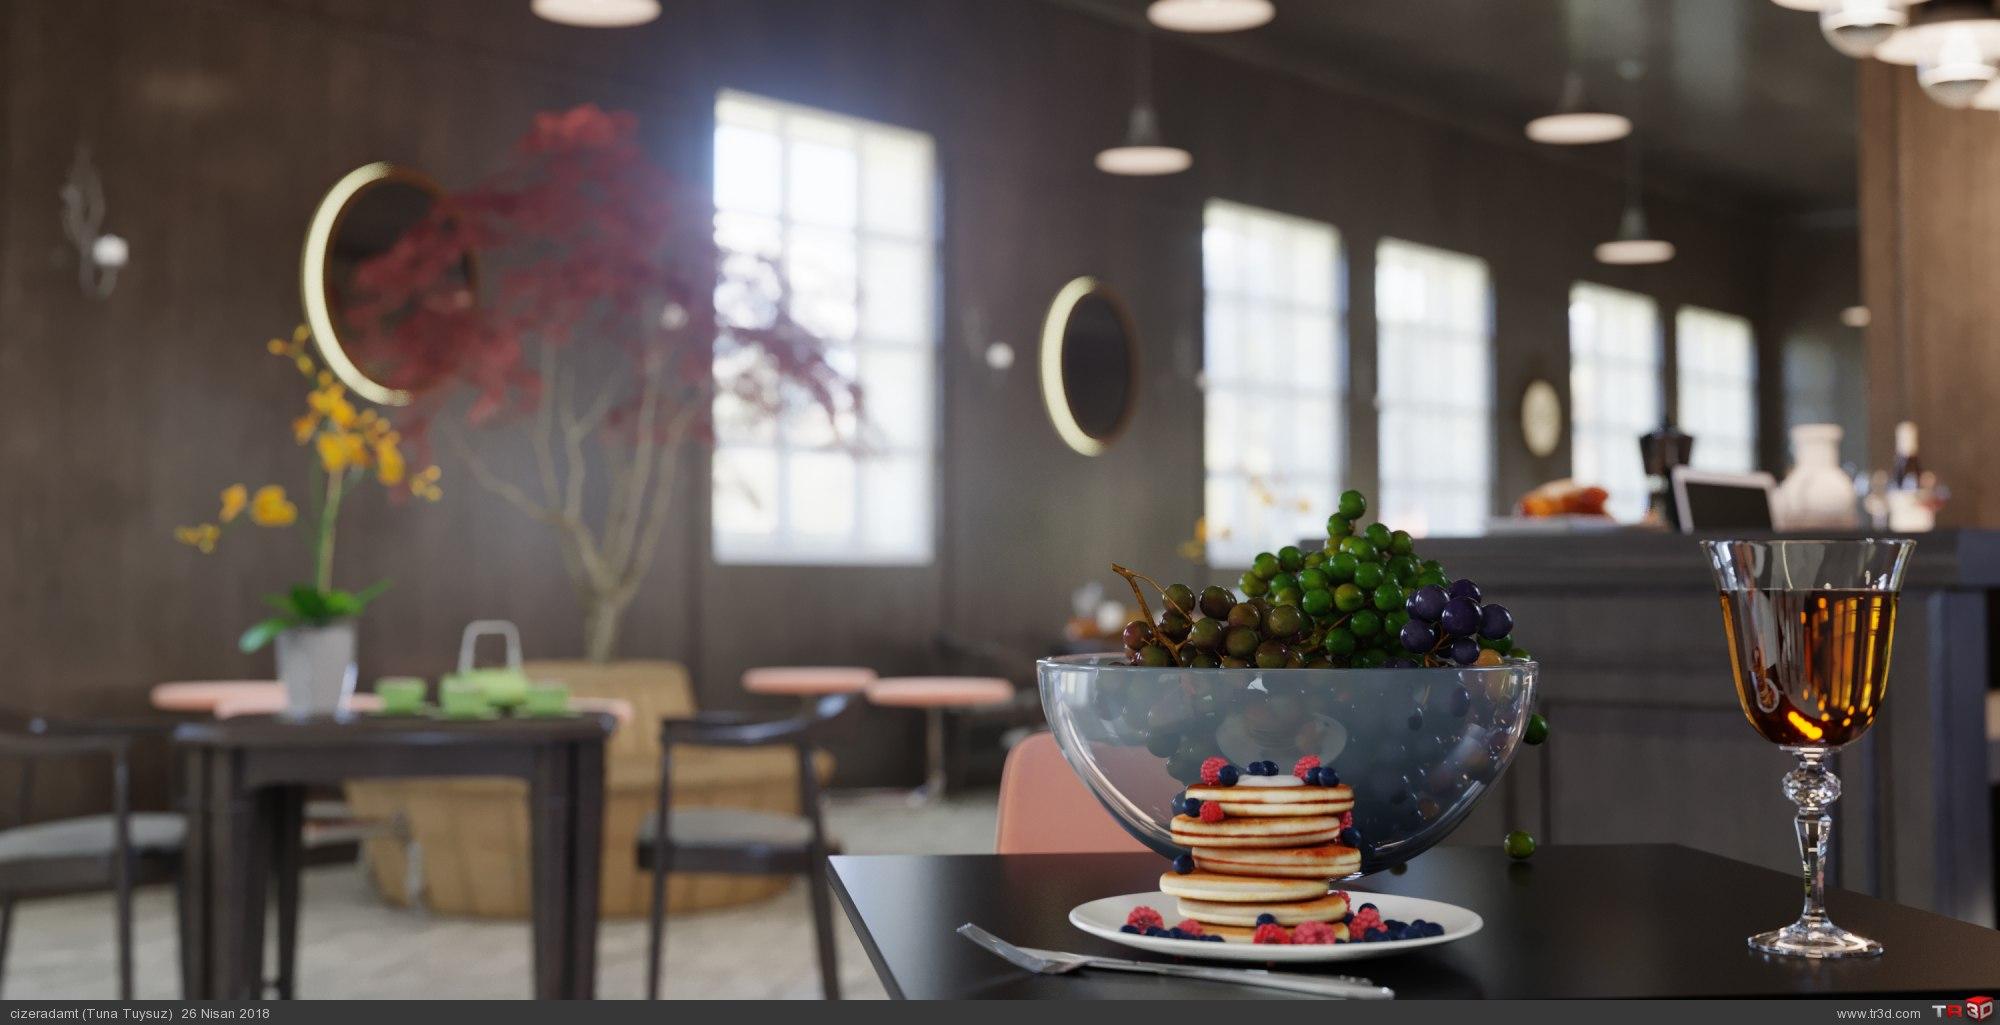 Anadolu Roma Enstitüsü Cafe Tasarımı 3